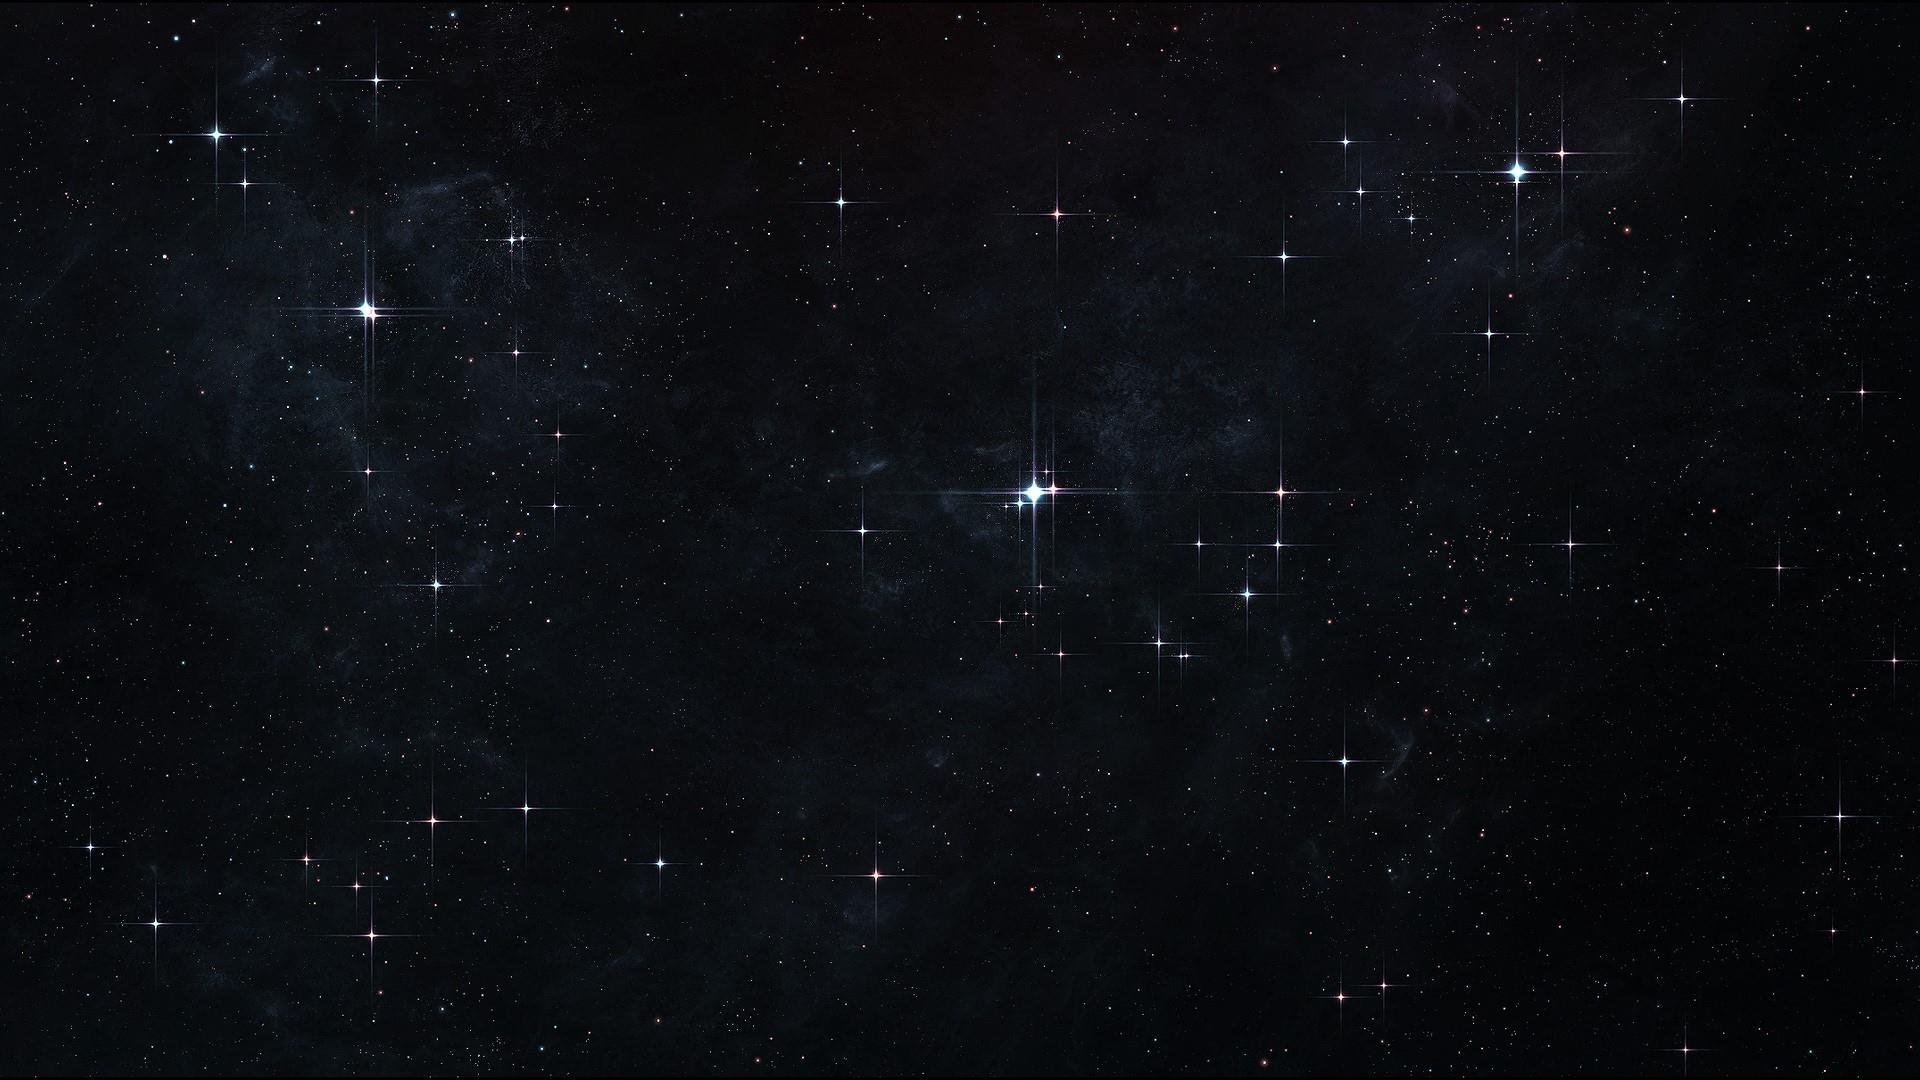 66 Hd Wallpaper Night Sky